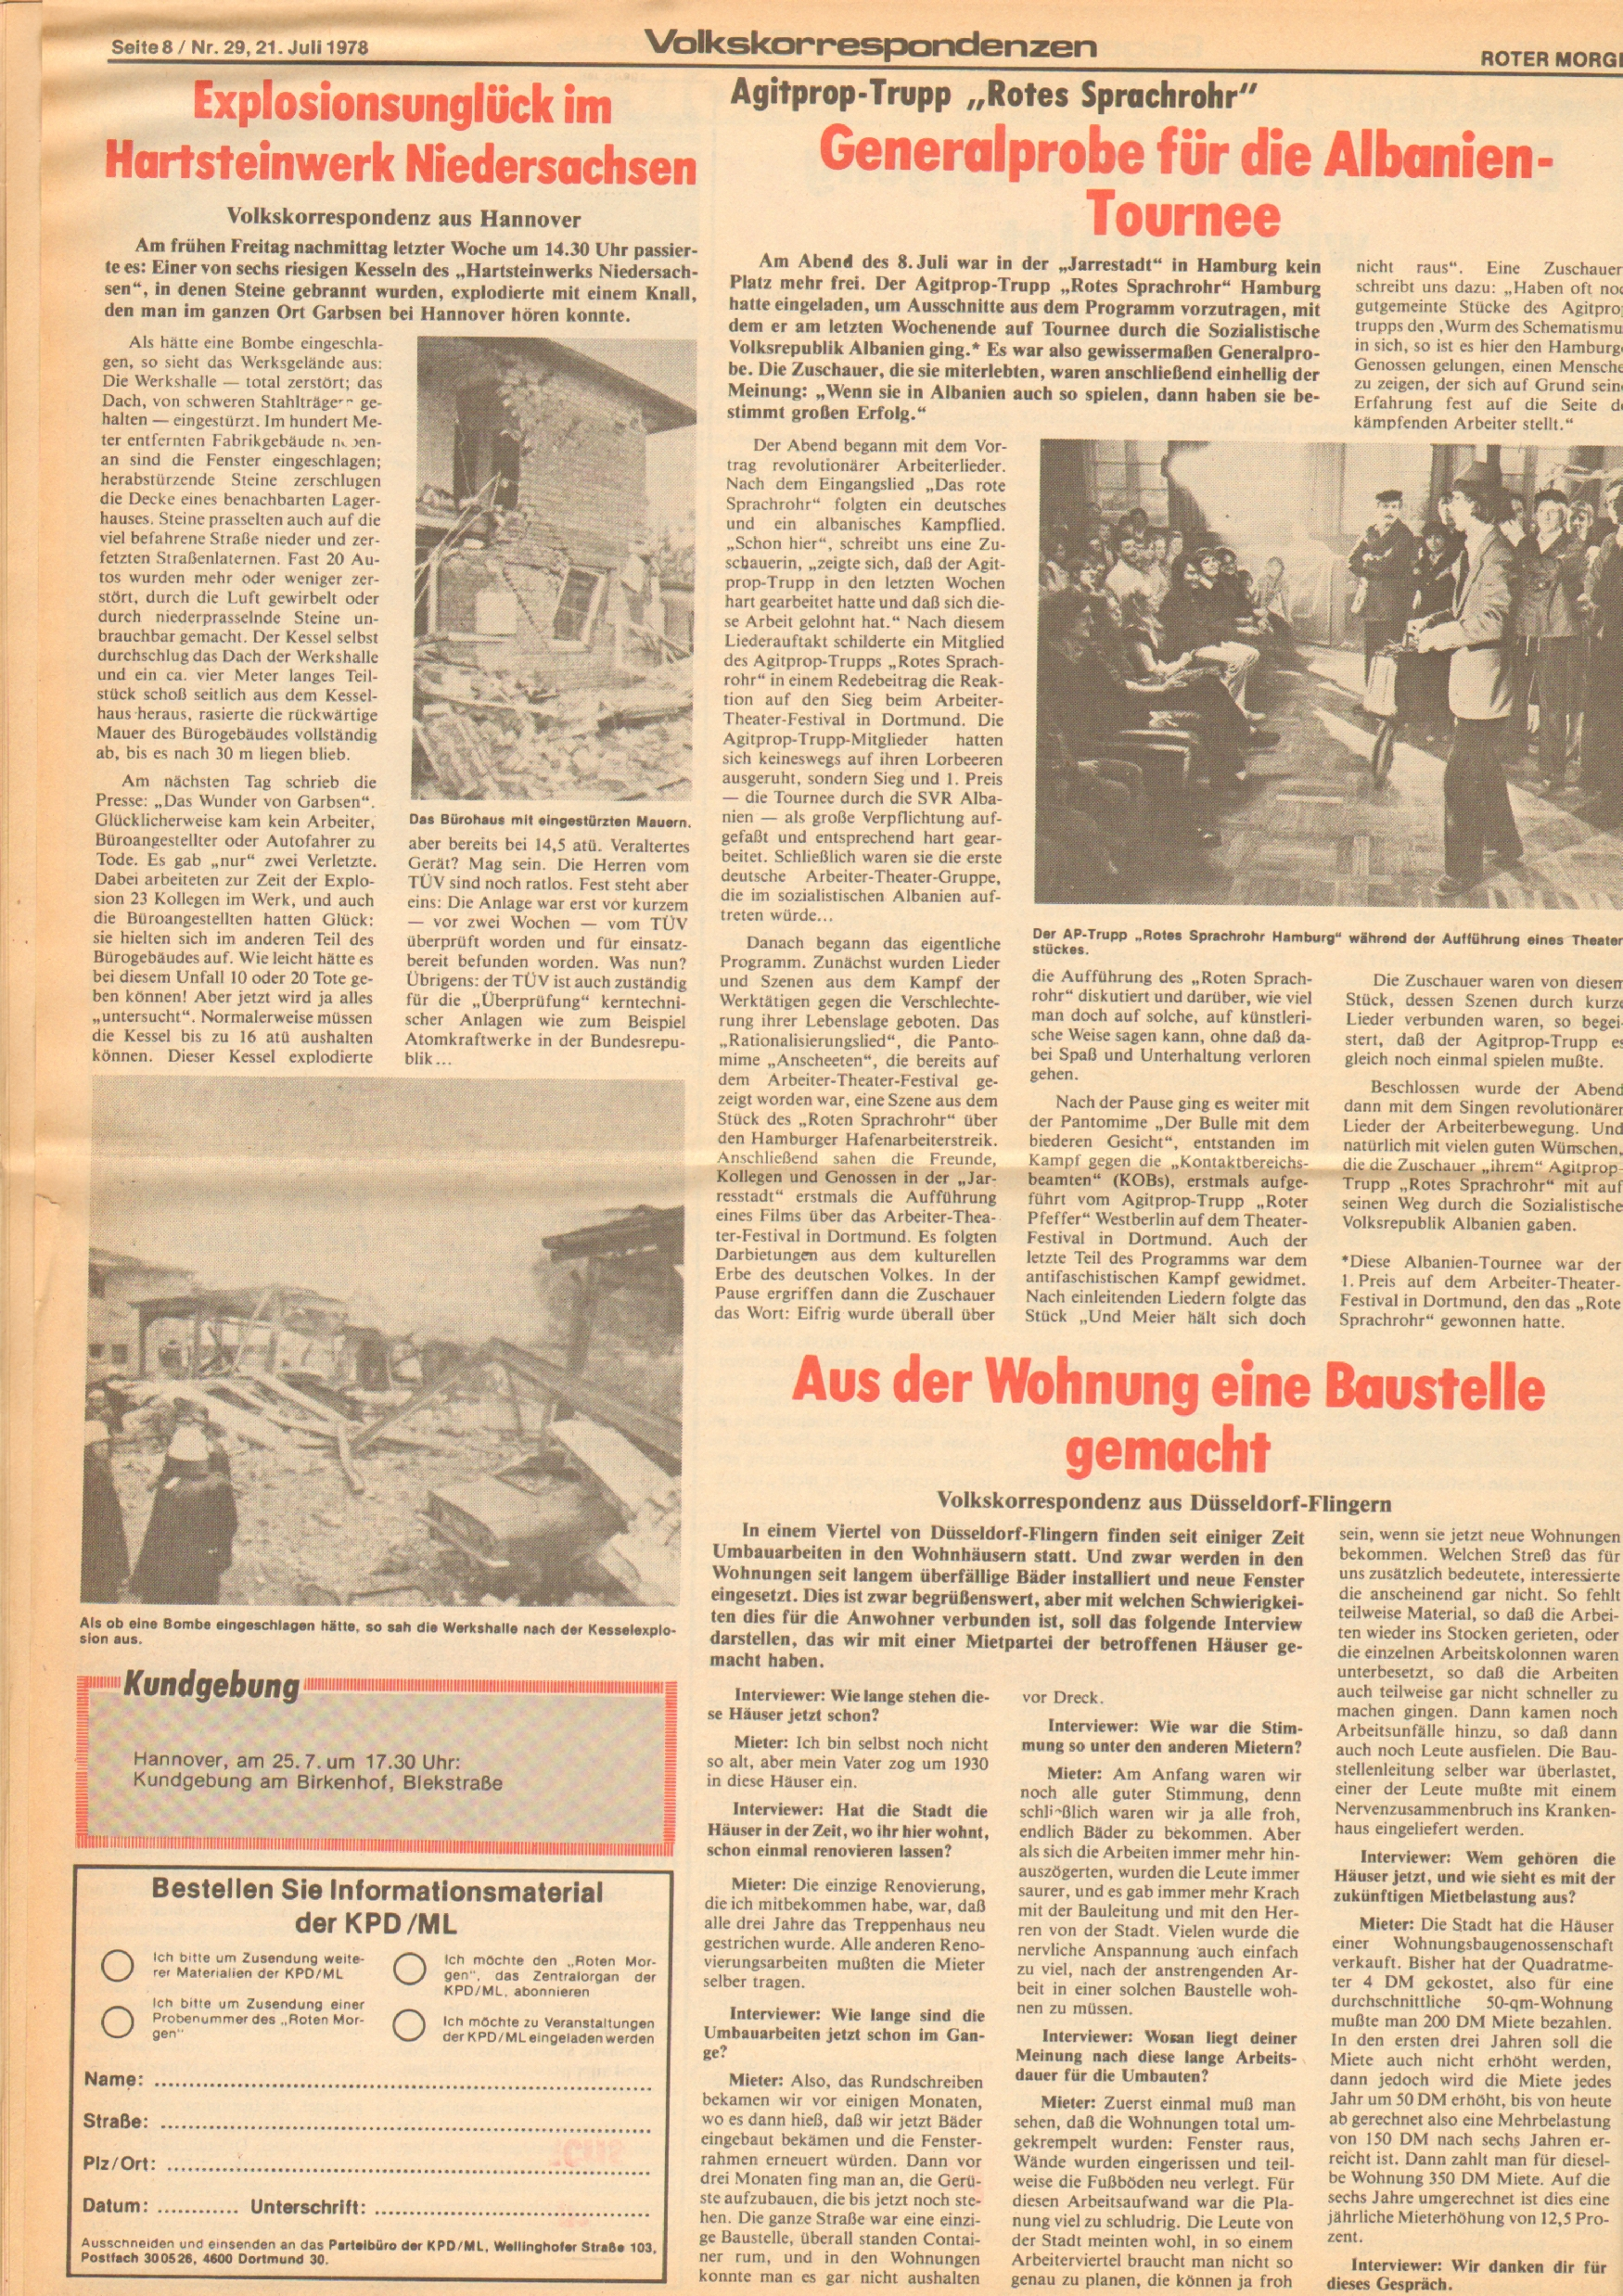 Roter Morgen, 12. Jg., 21. Juli 1978, Nr. 29, Seite 8